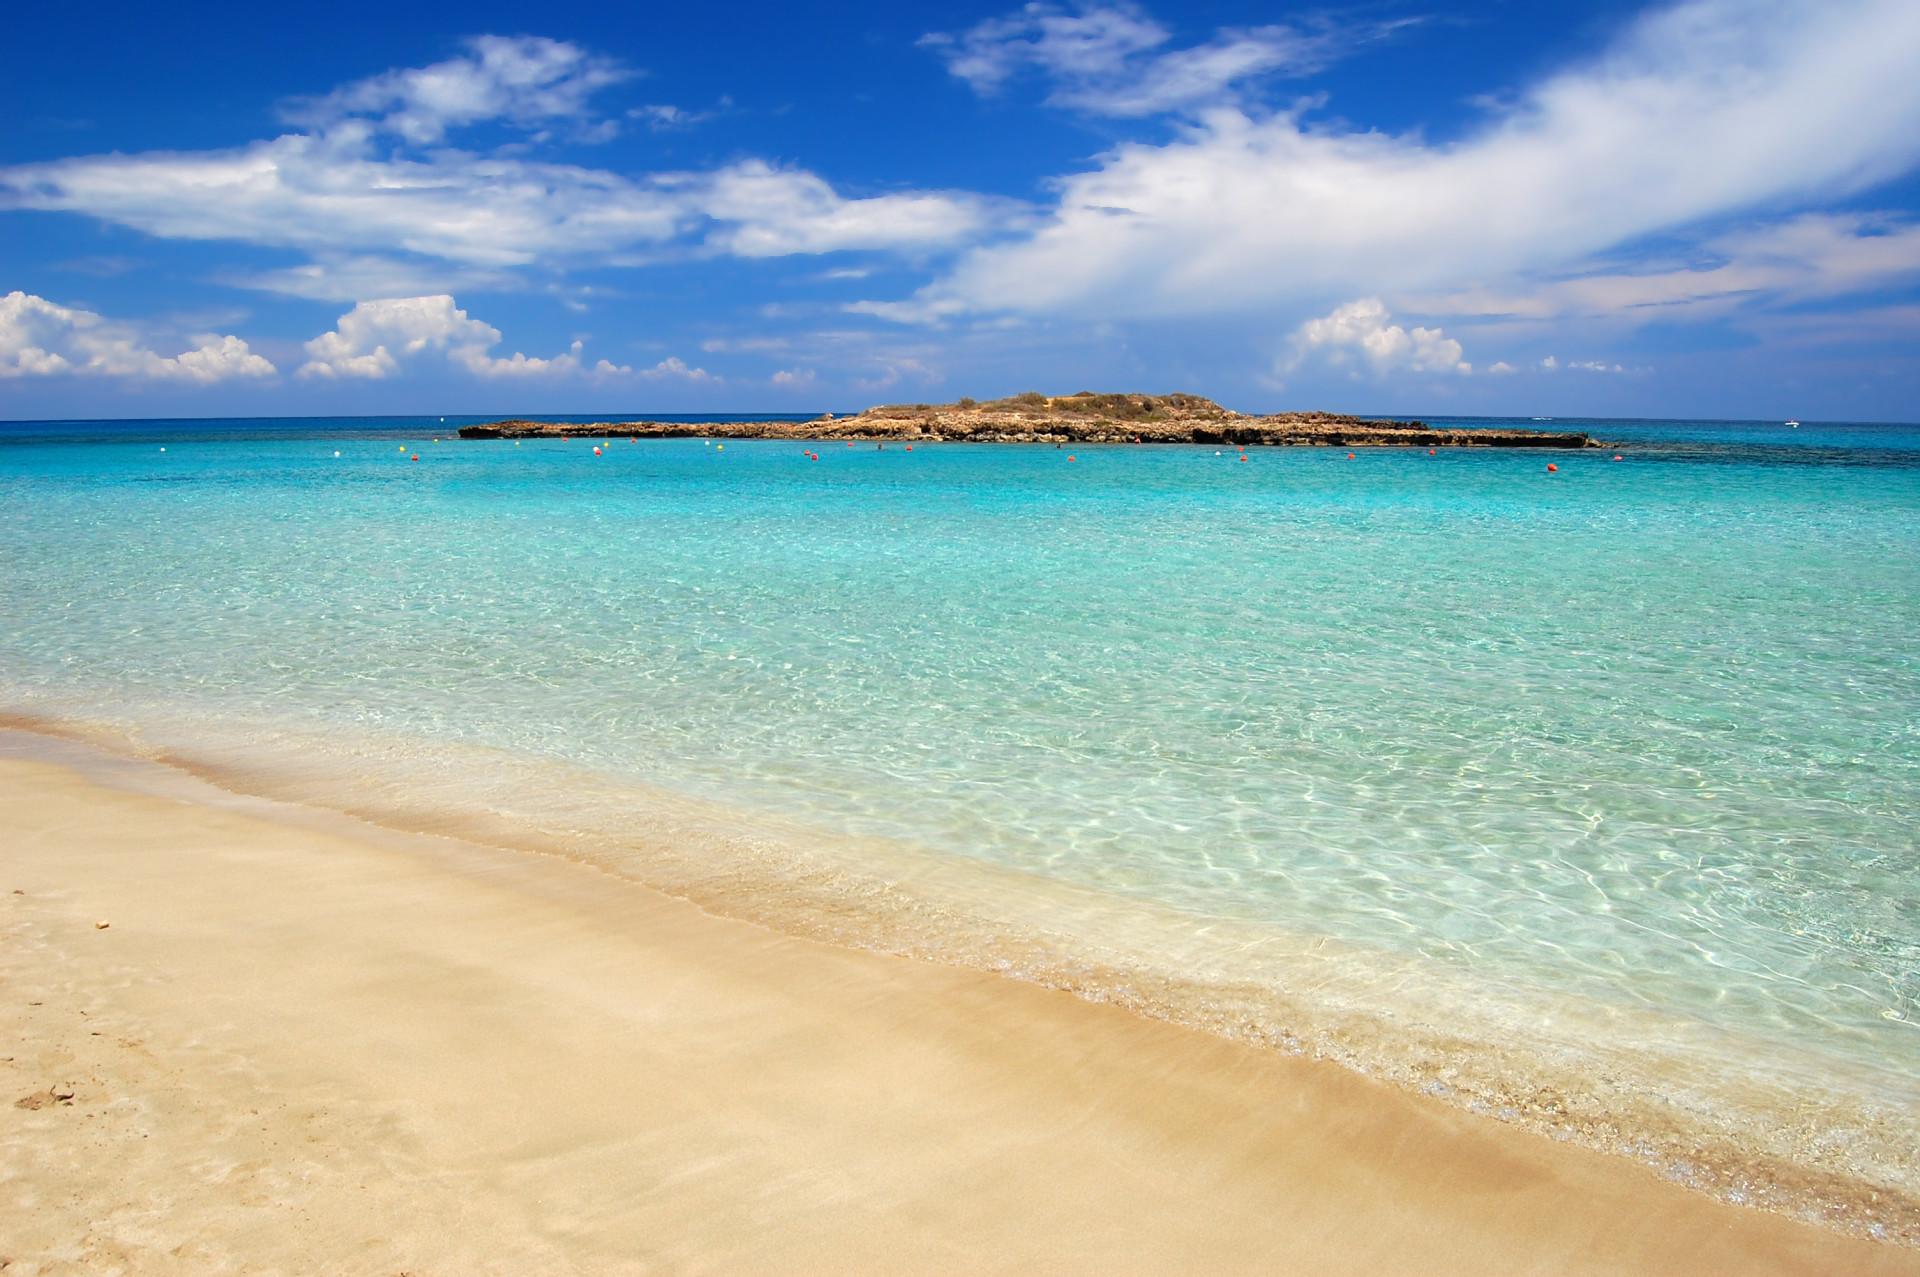 Zonvakantie Cyprus, strand Protaras/Ayia Napa, Cyprus